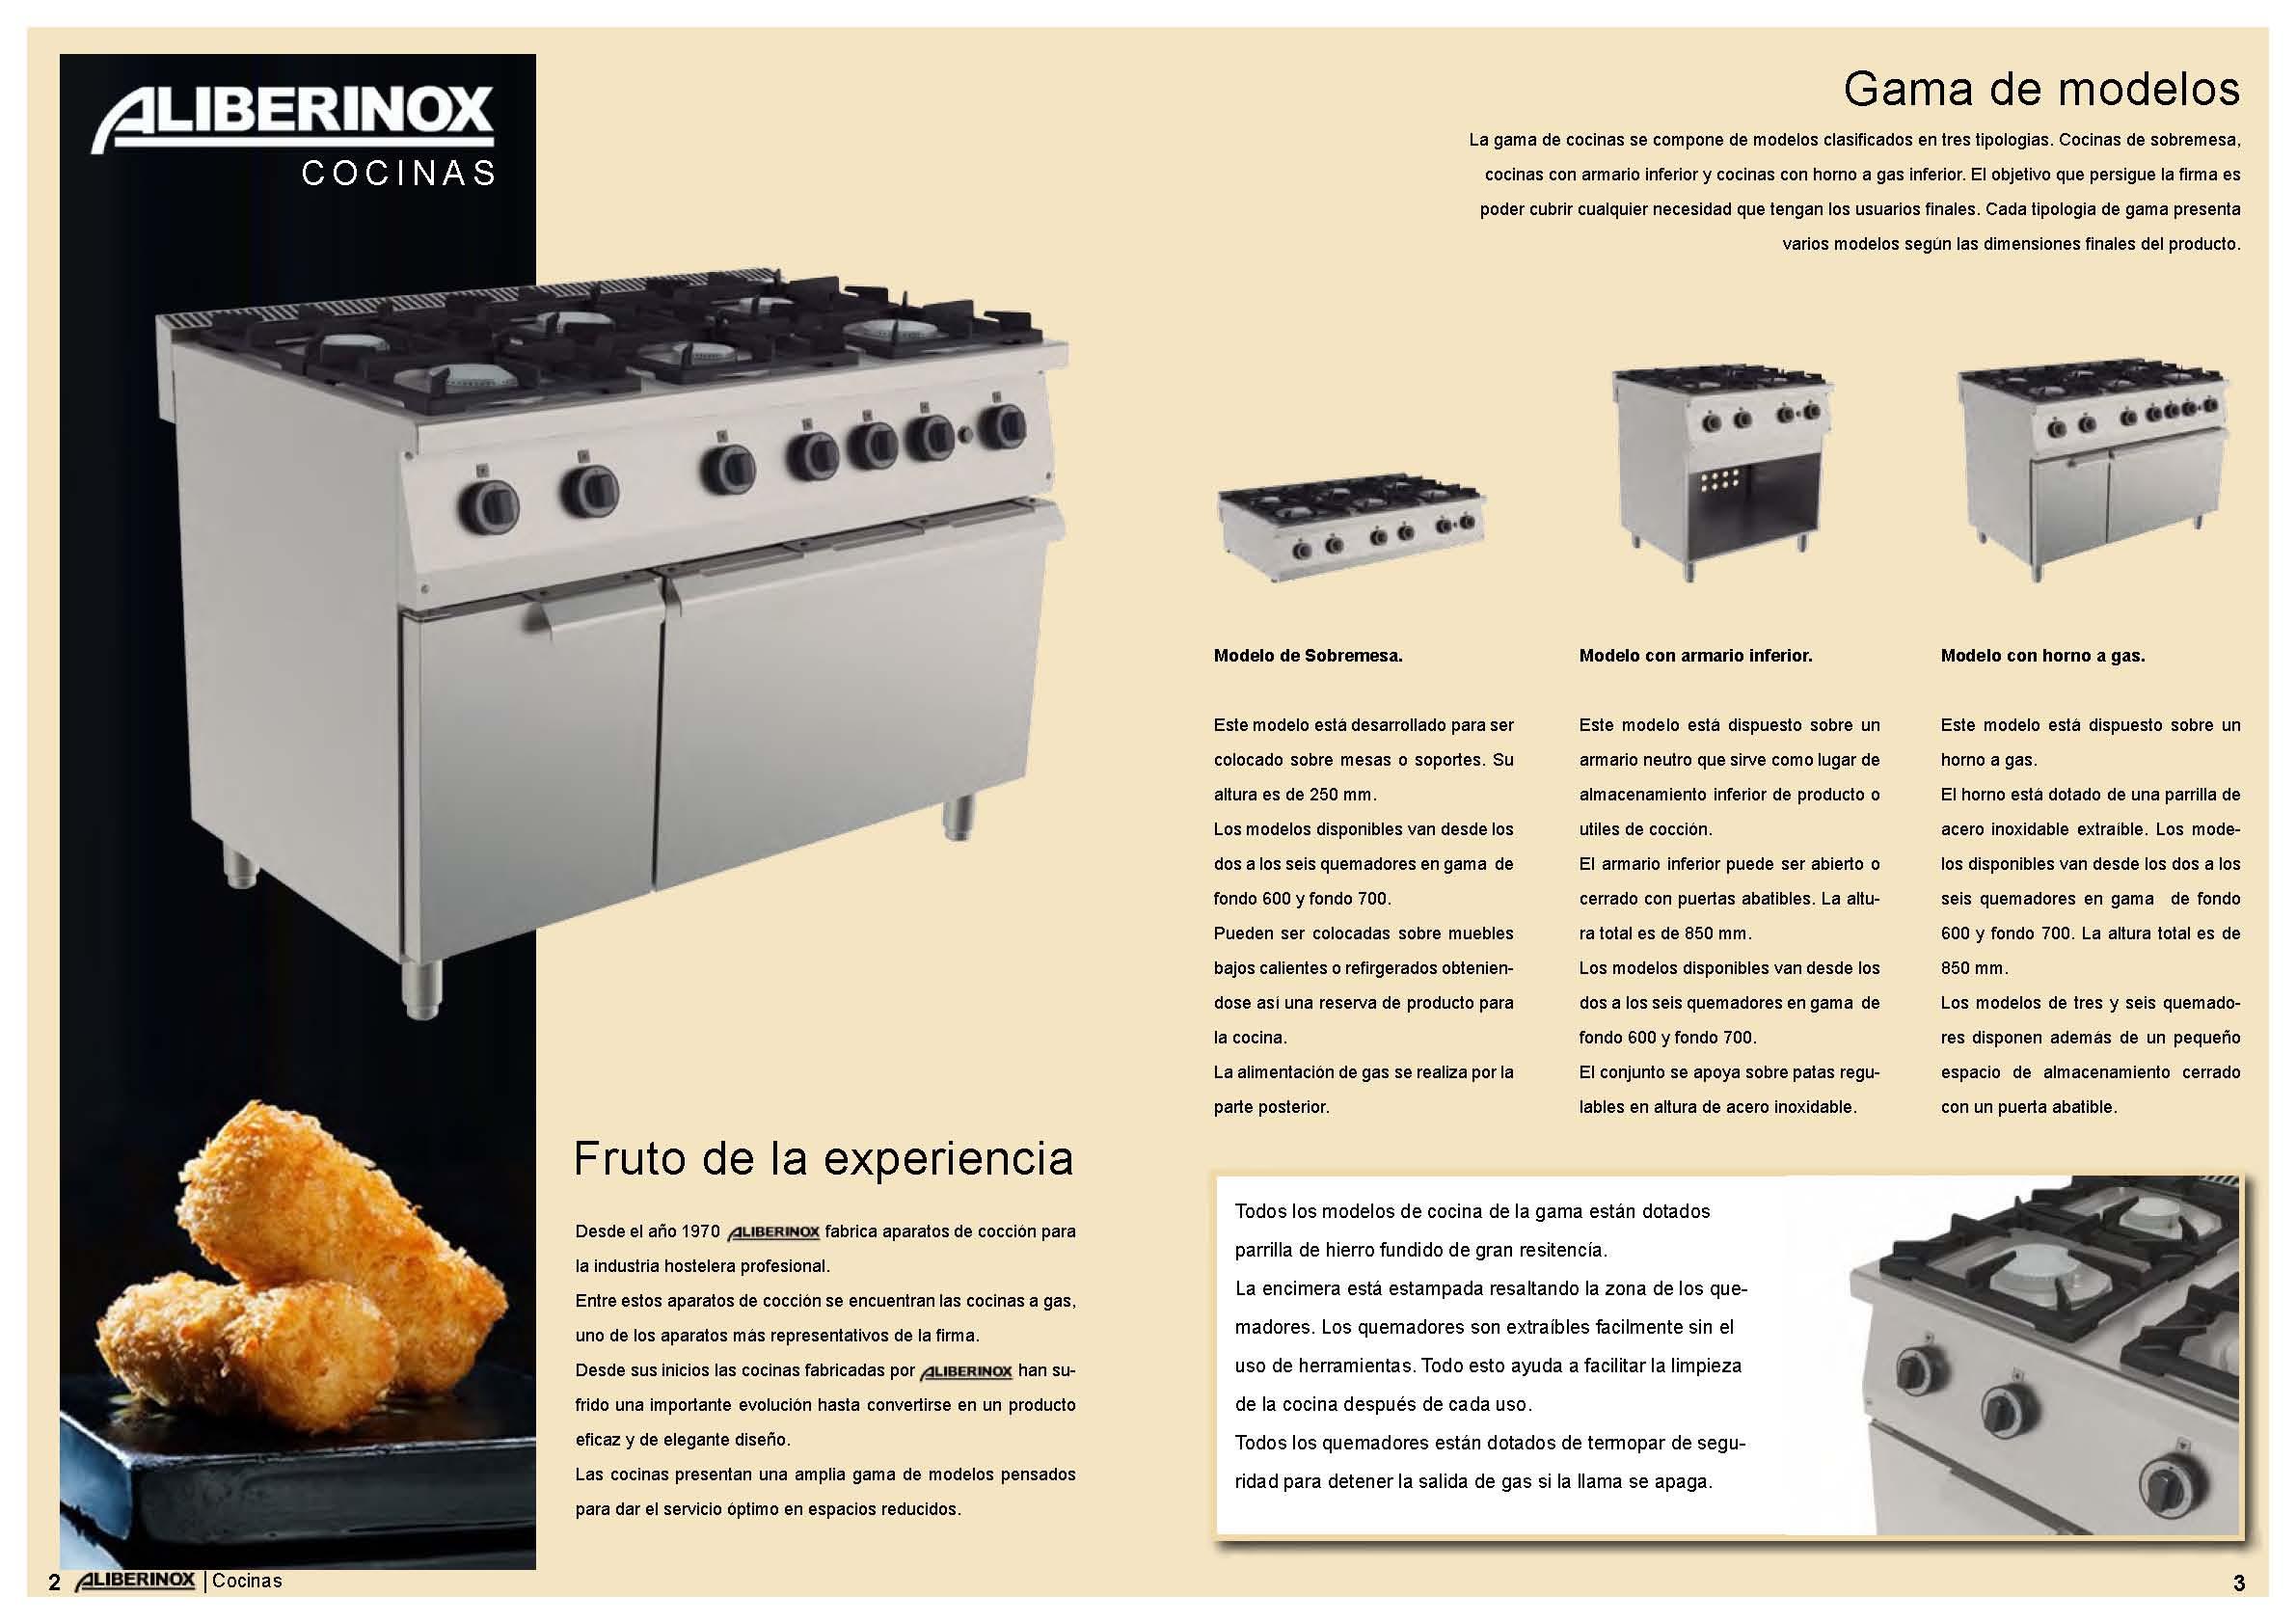 ALIBERINOX COCINAS_Page_2